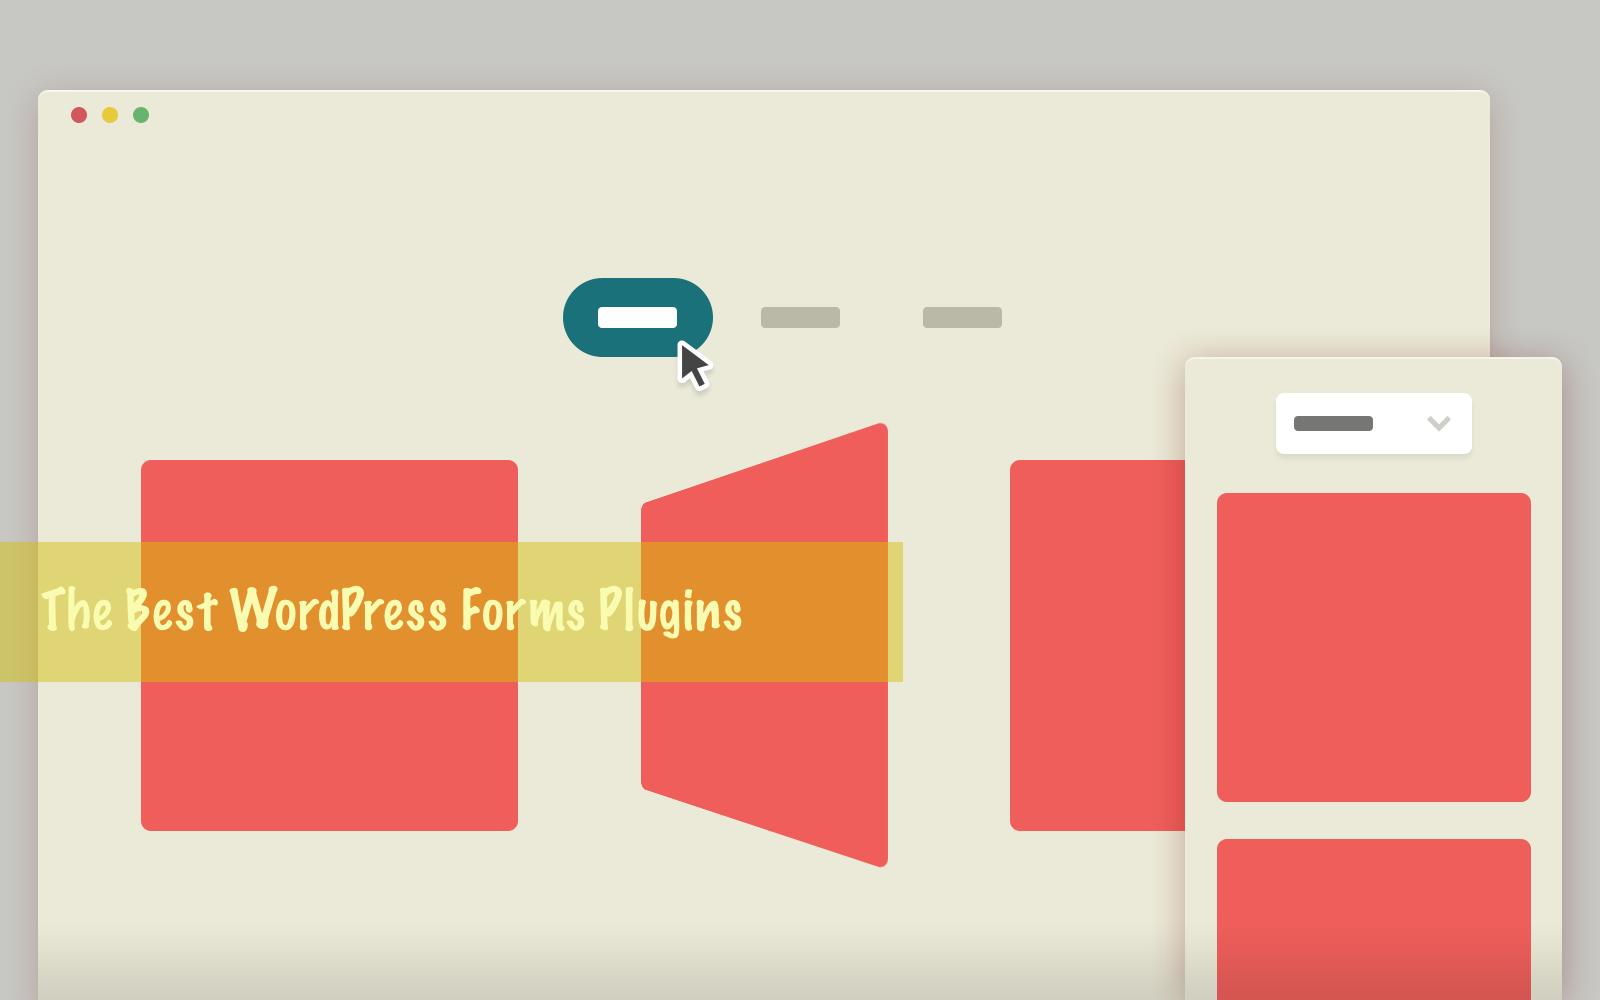 Best WordPress Forms Plugins